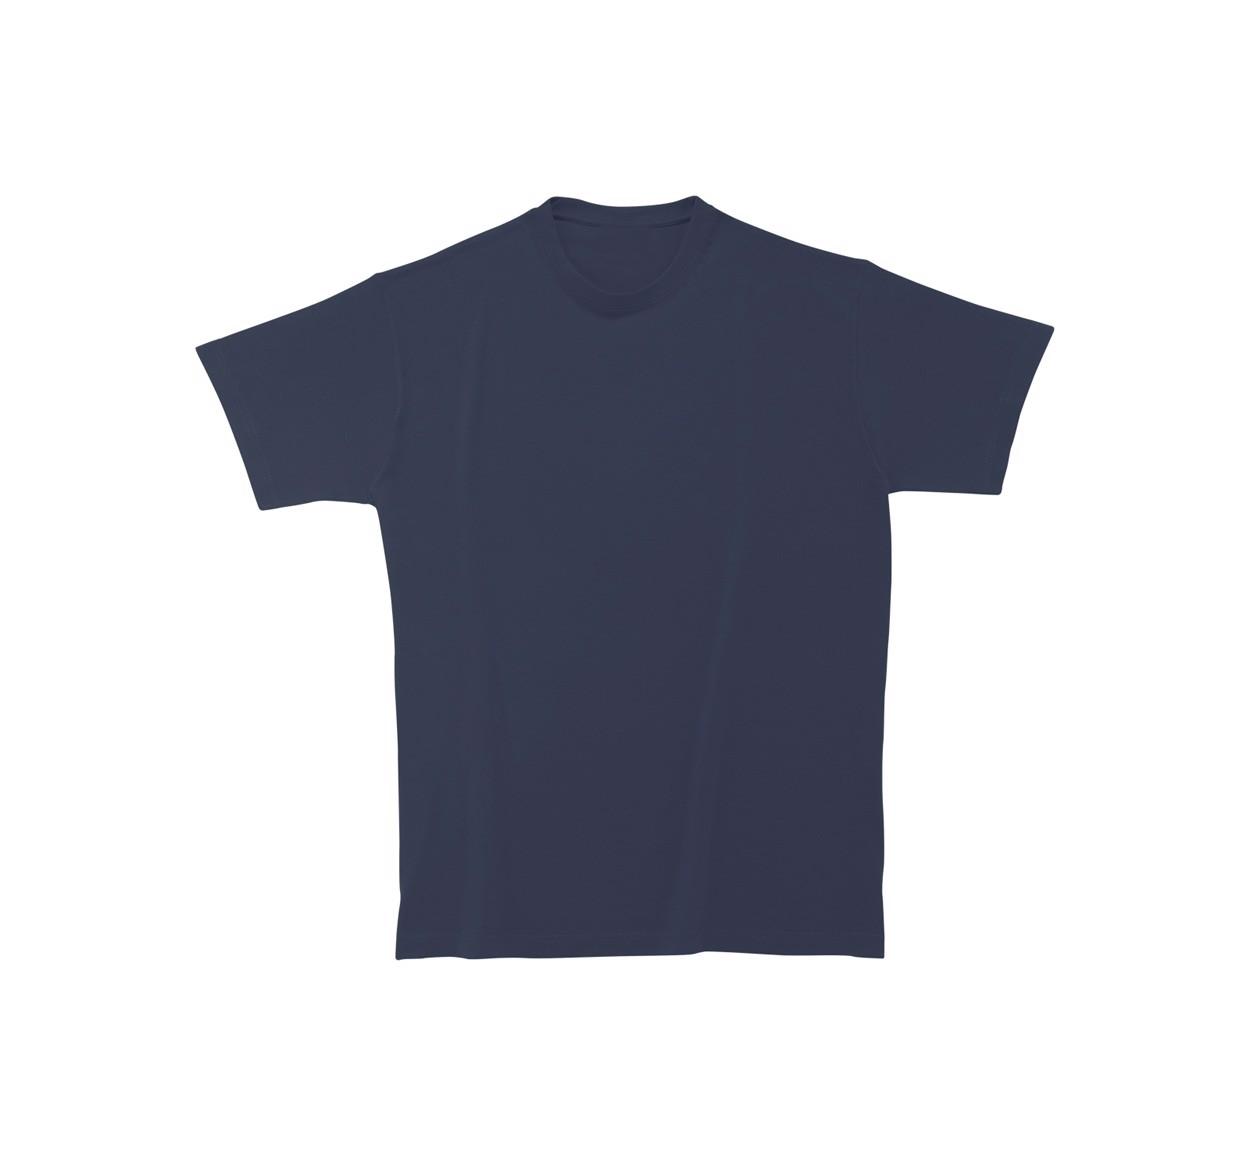 Tričko Heavy Cotton - Tmavě Modrá / S